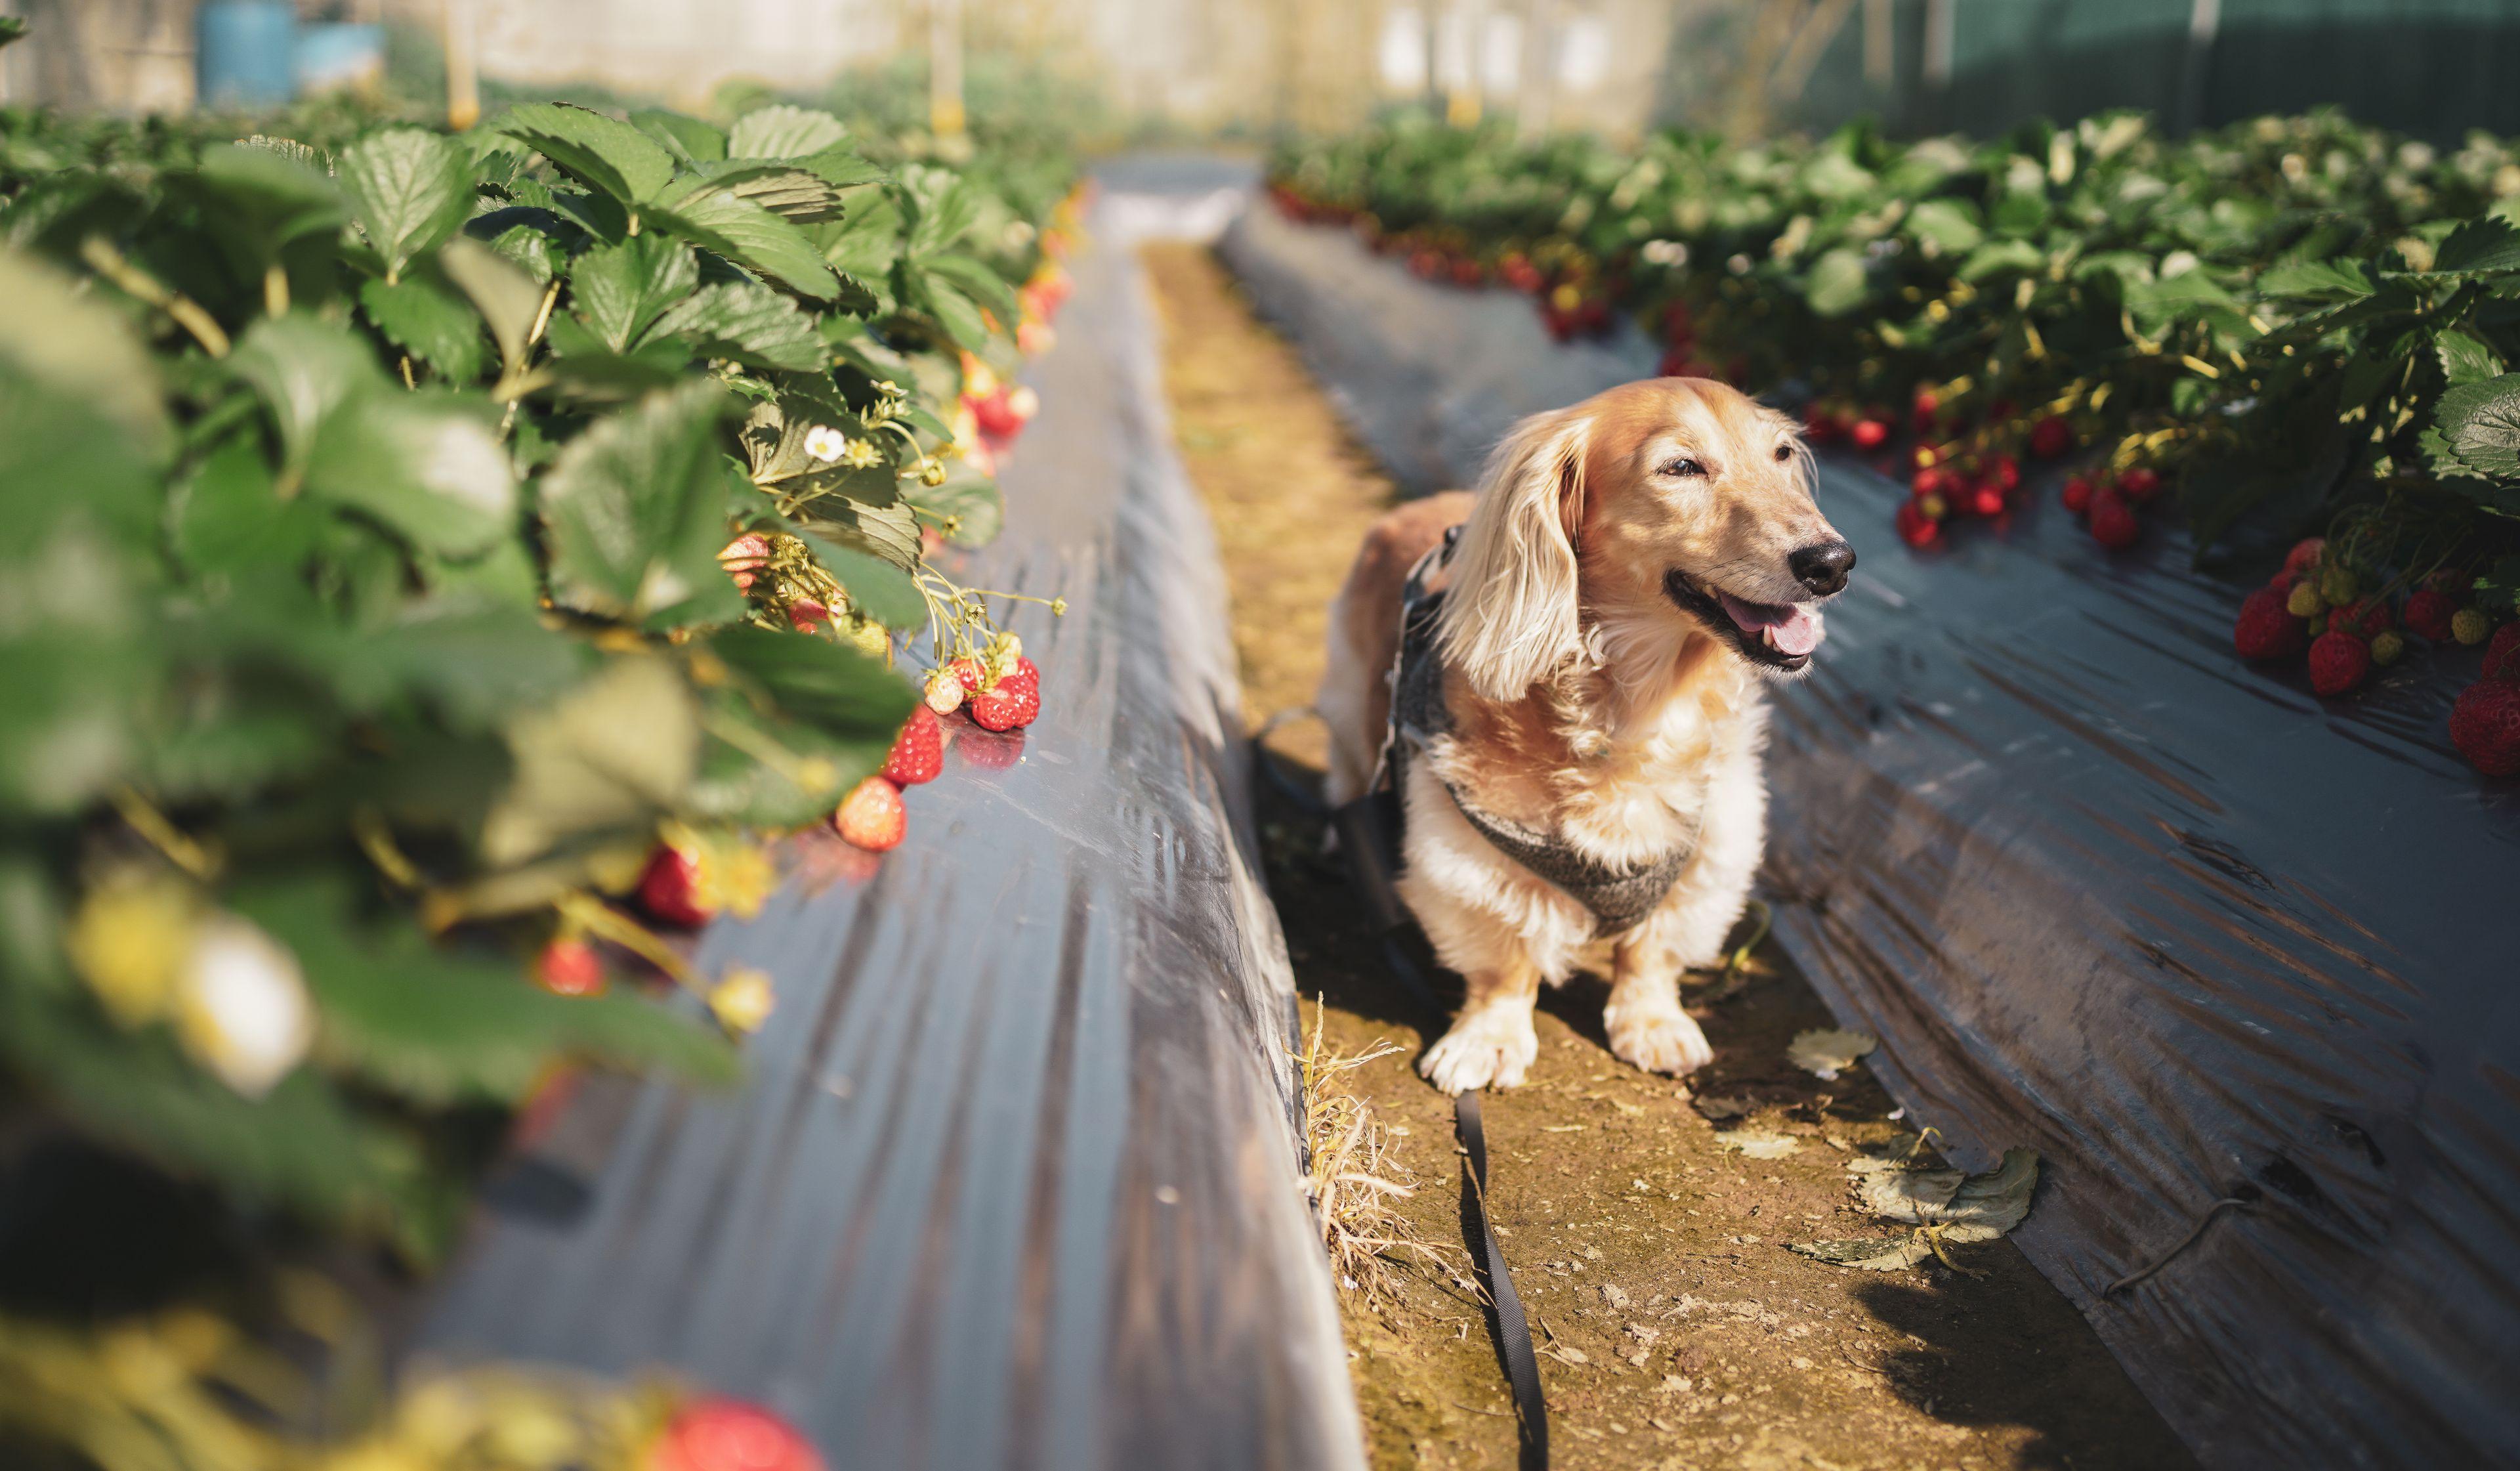 cane a caccia di fragole